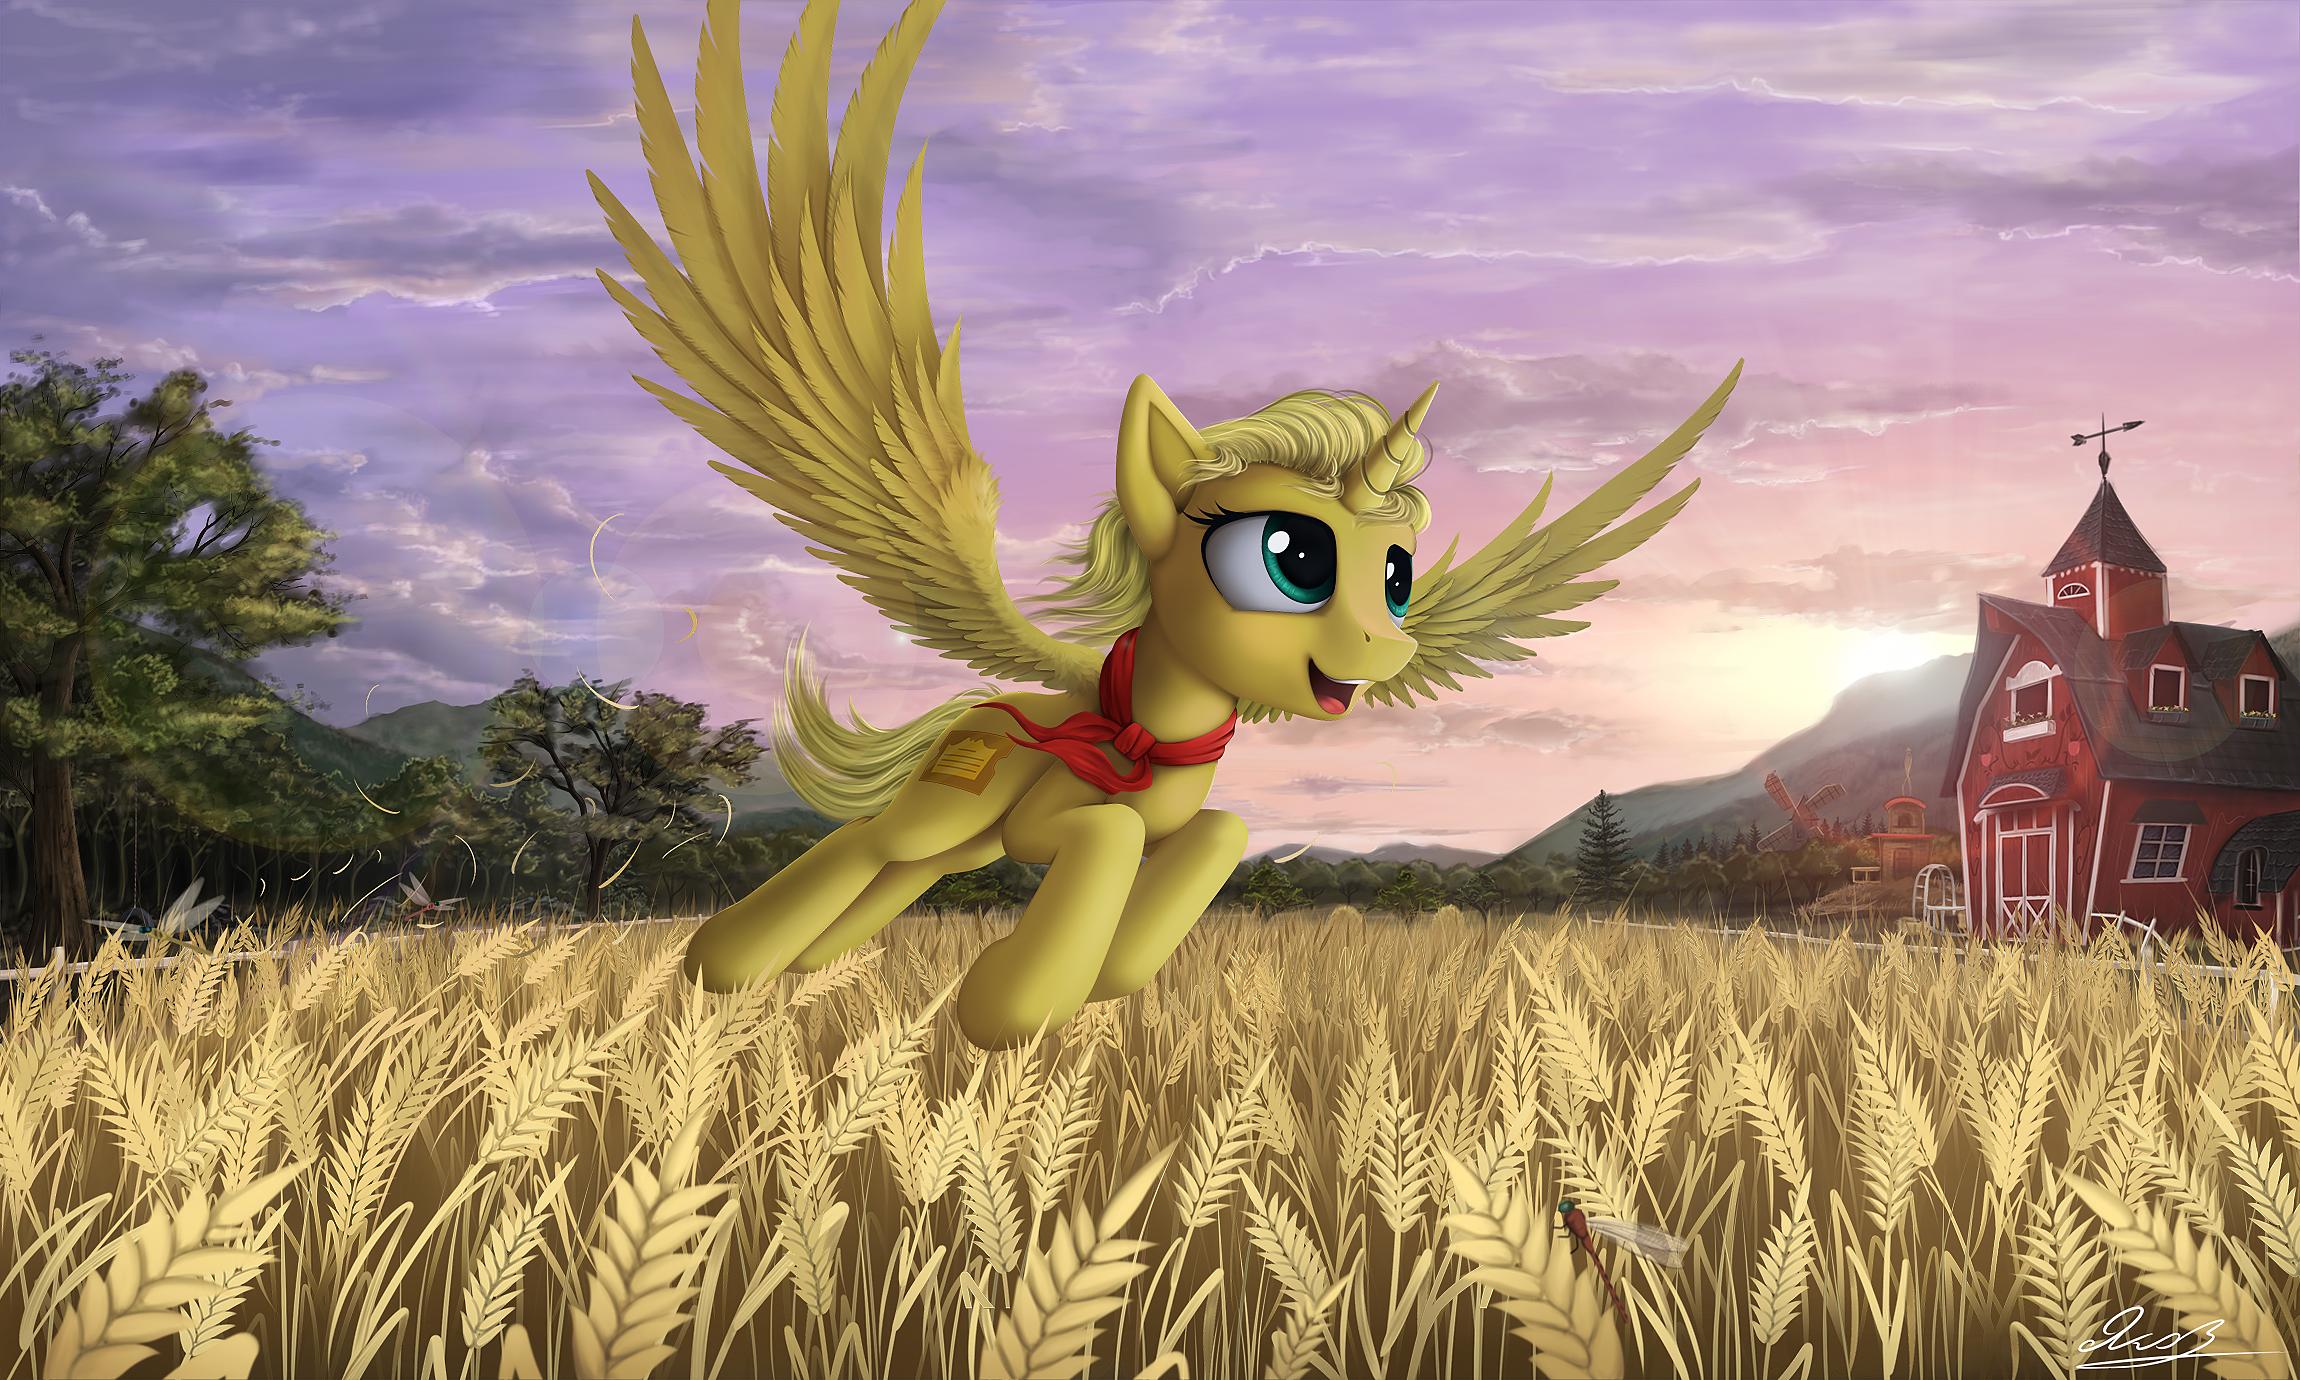 golden fields (commission)